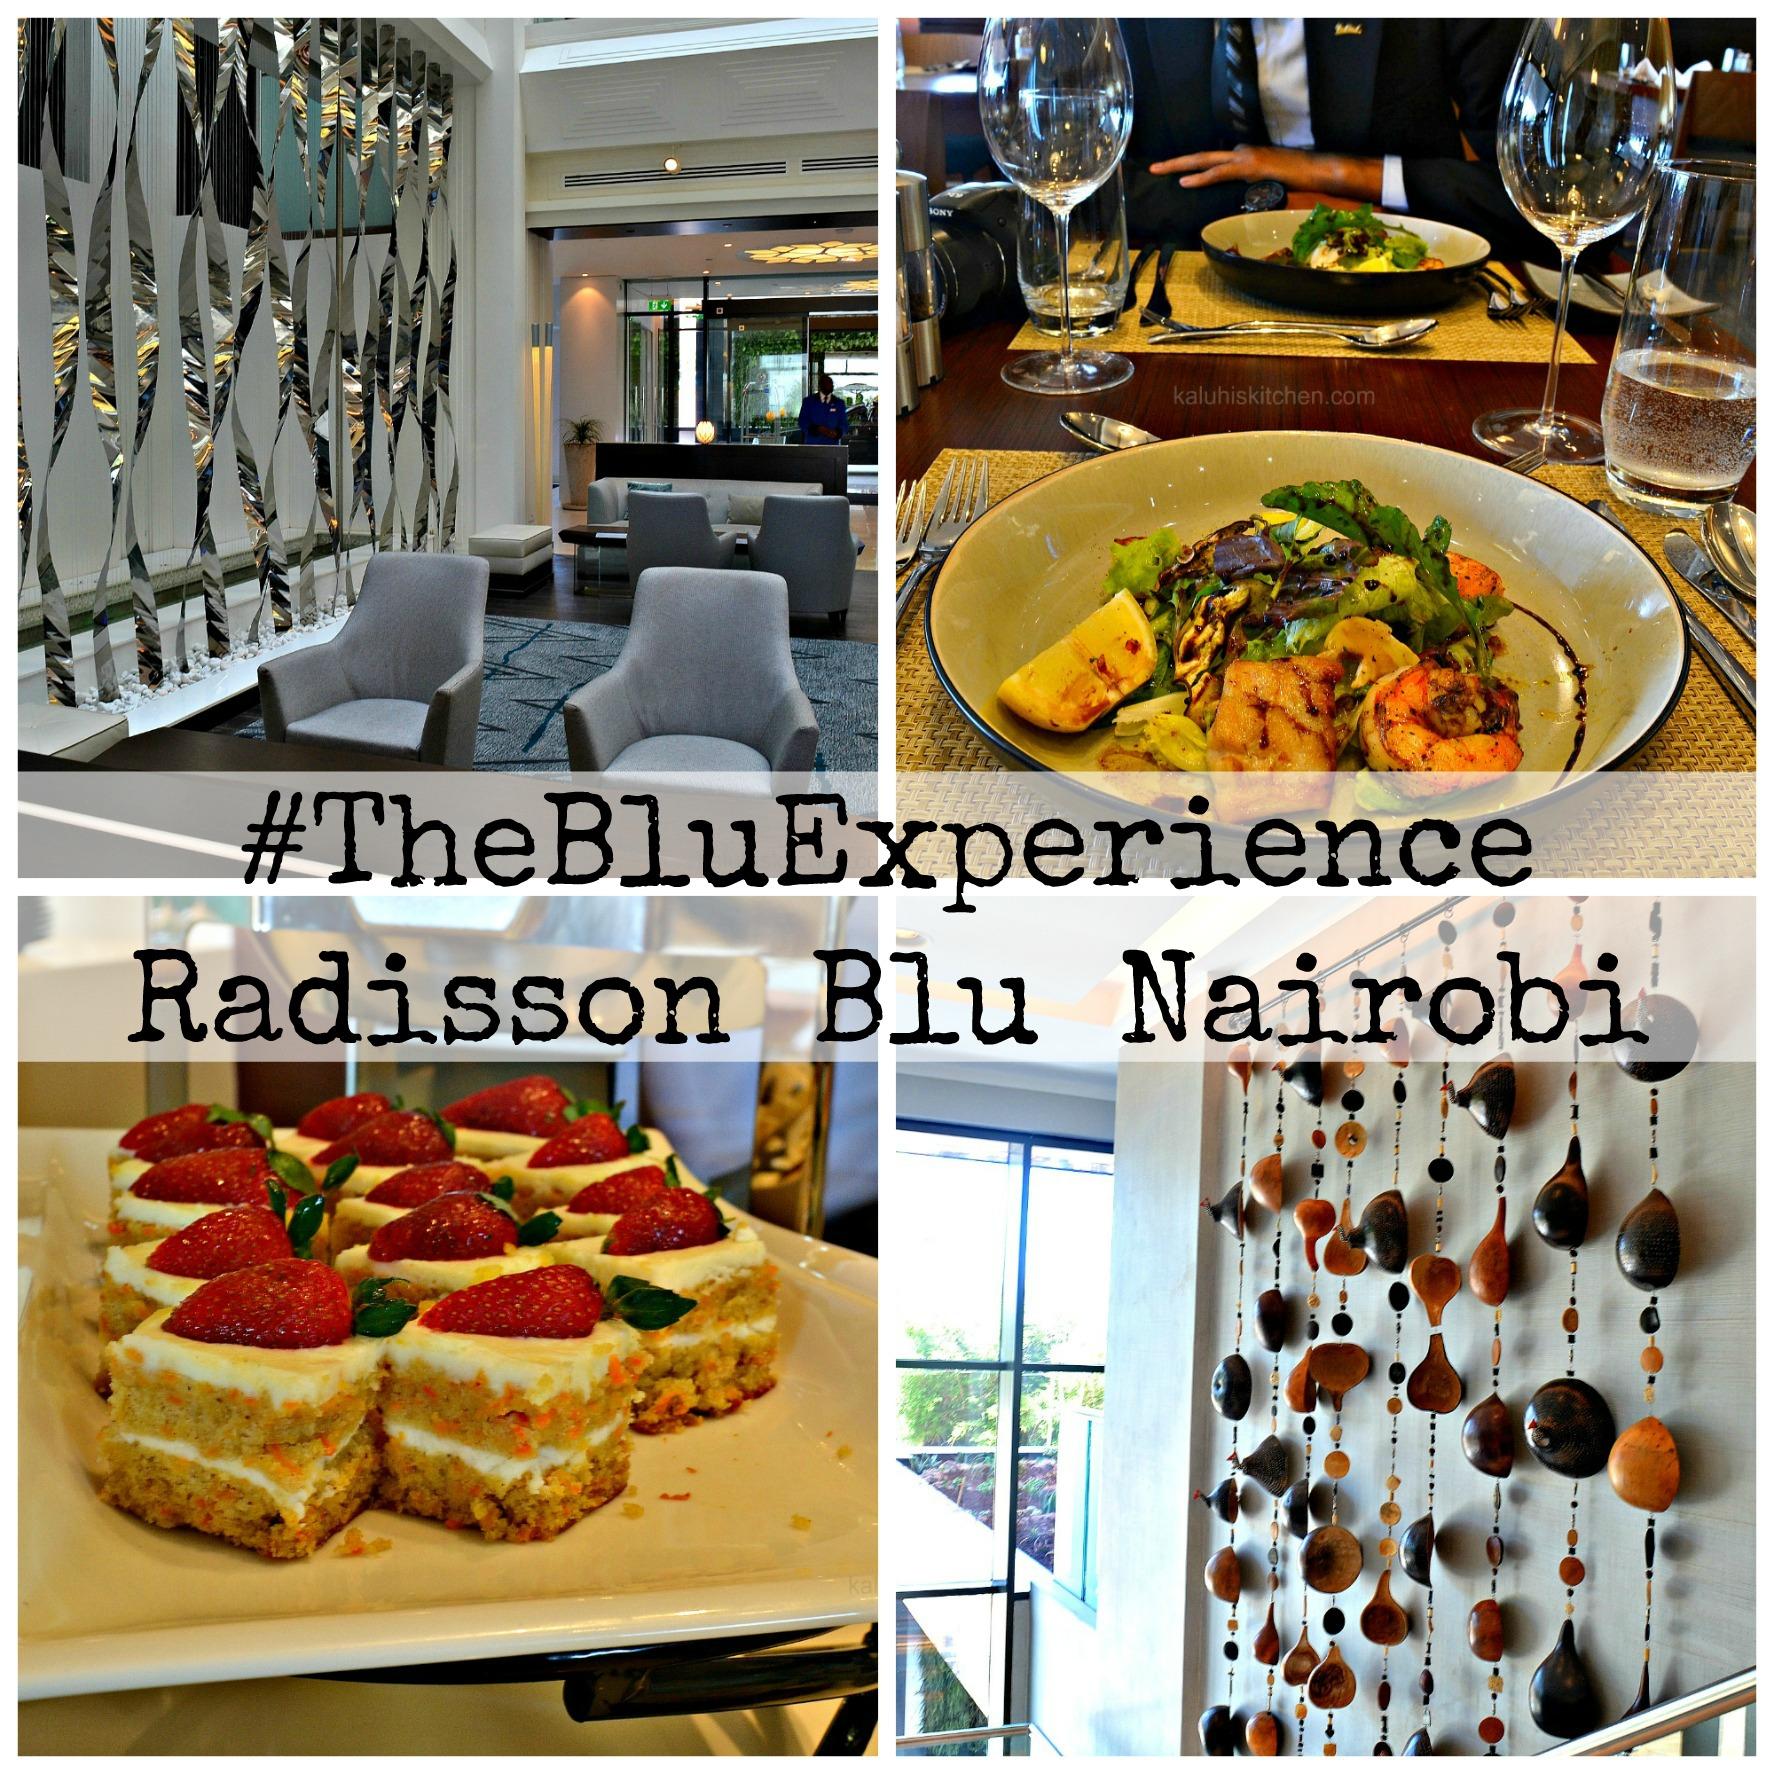 Radisson Blu Nairobi_best nairobi hotels_best food blogger in Kenya_kaluhiskitchen.com